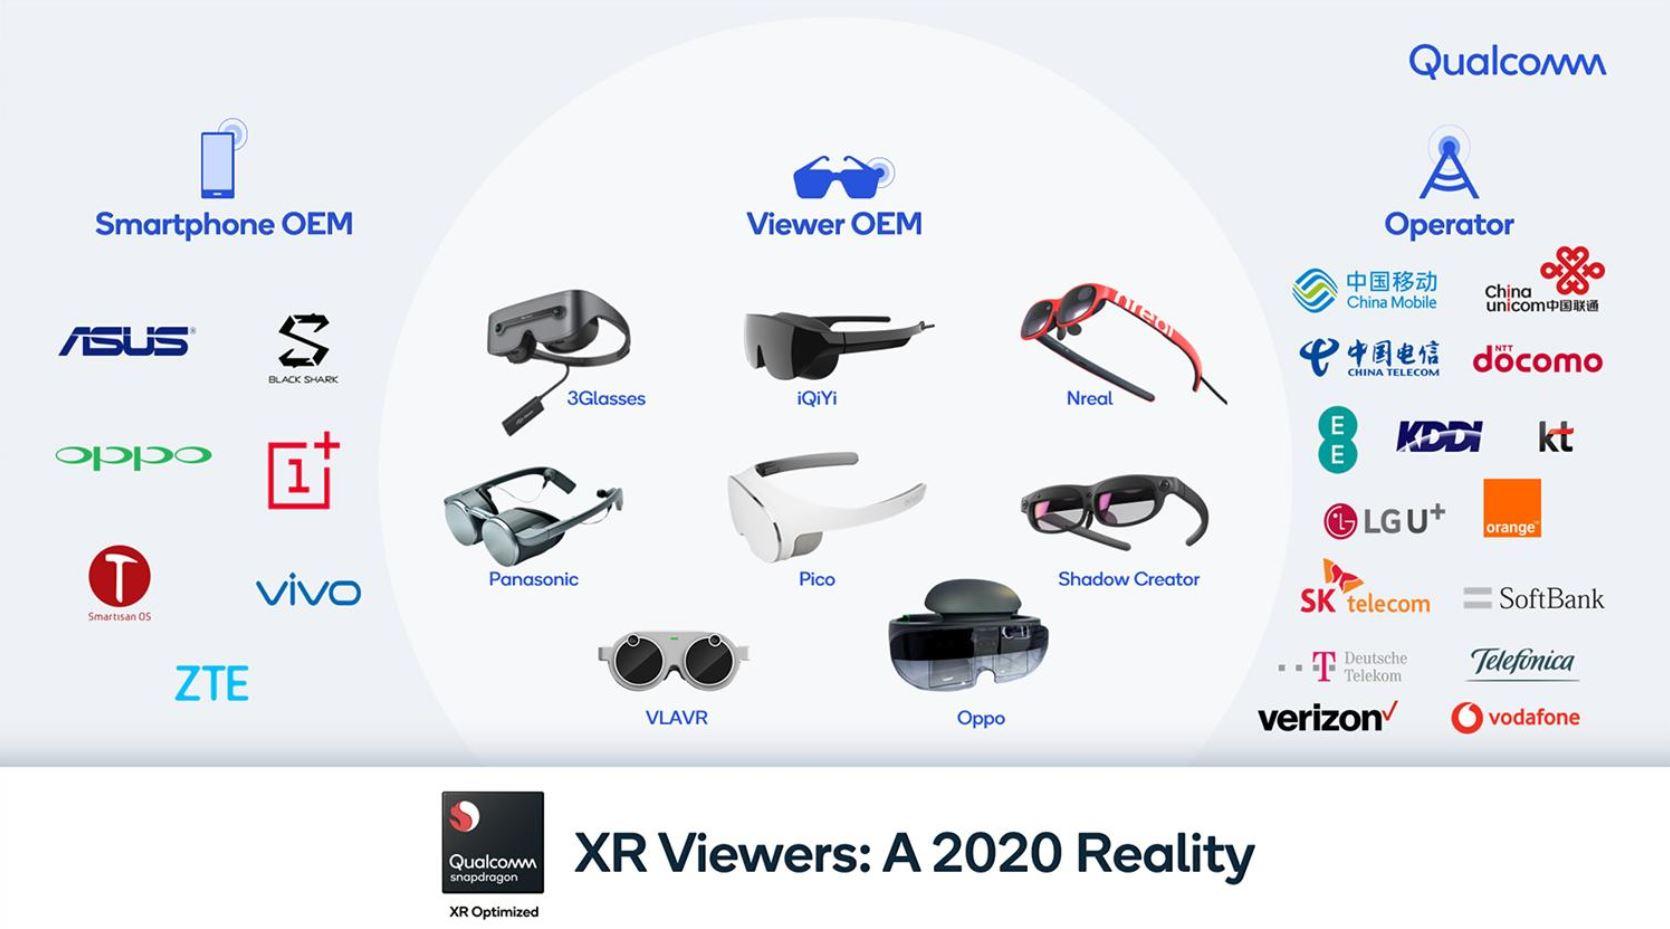 XR Viewers